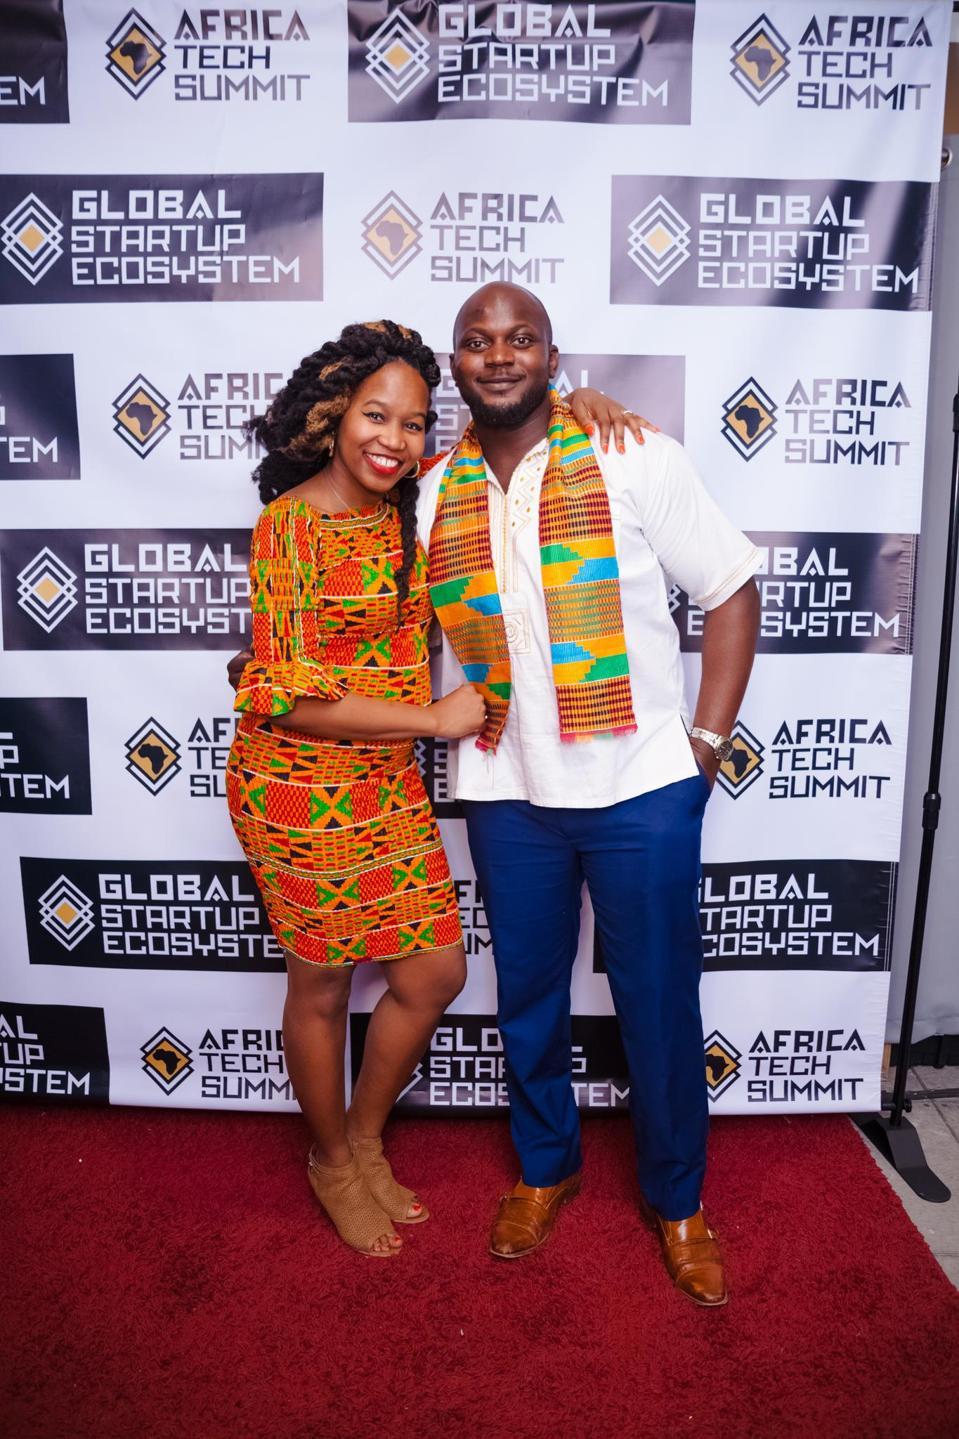 Africa Tech Summit